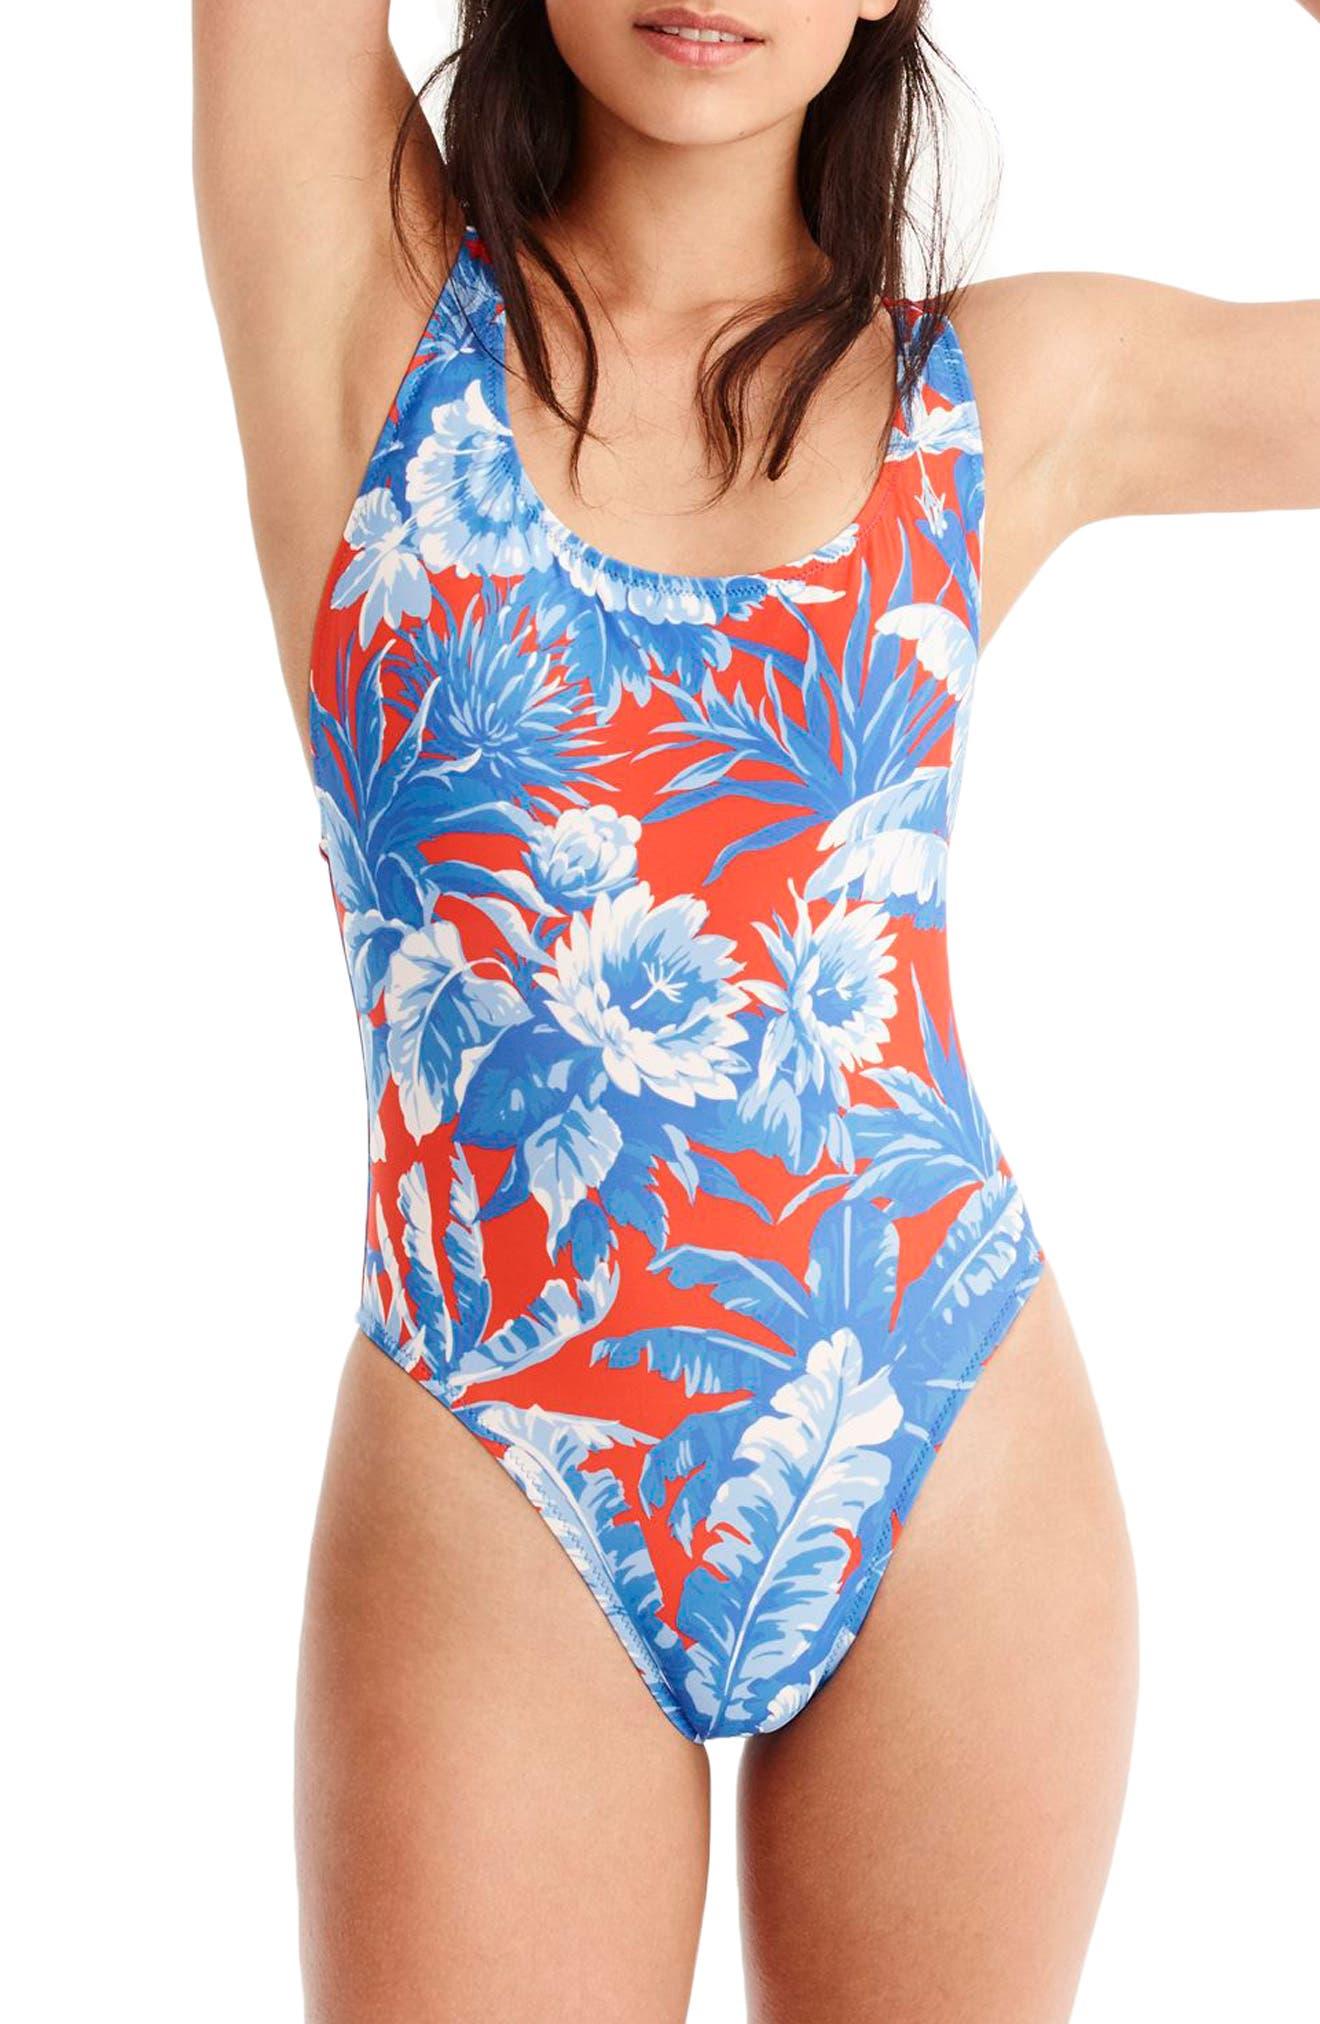 Ratti Rio Floral One-Piece Swimsuit,                         Main,                         color, Blue Multi